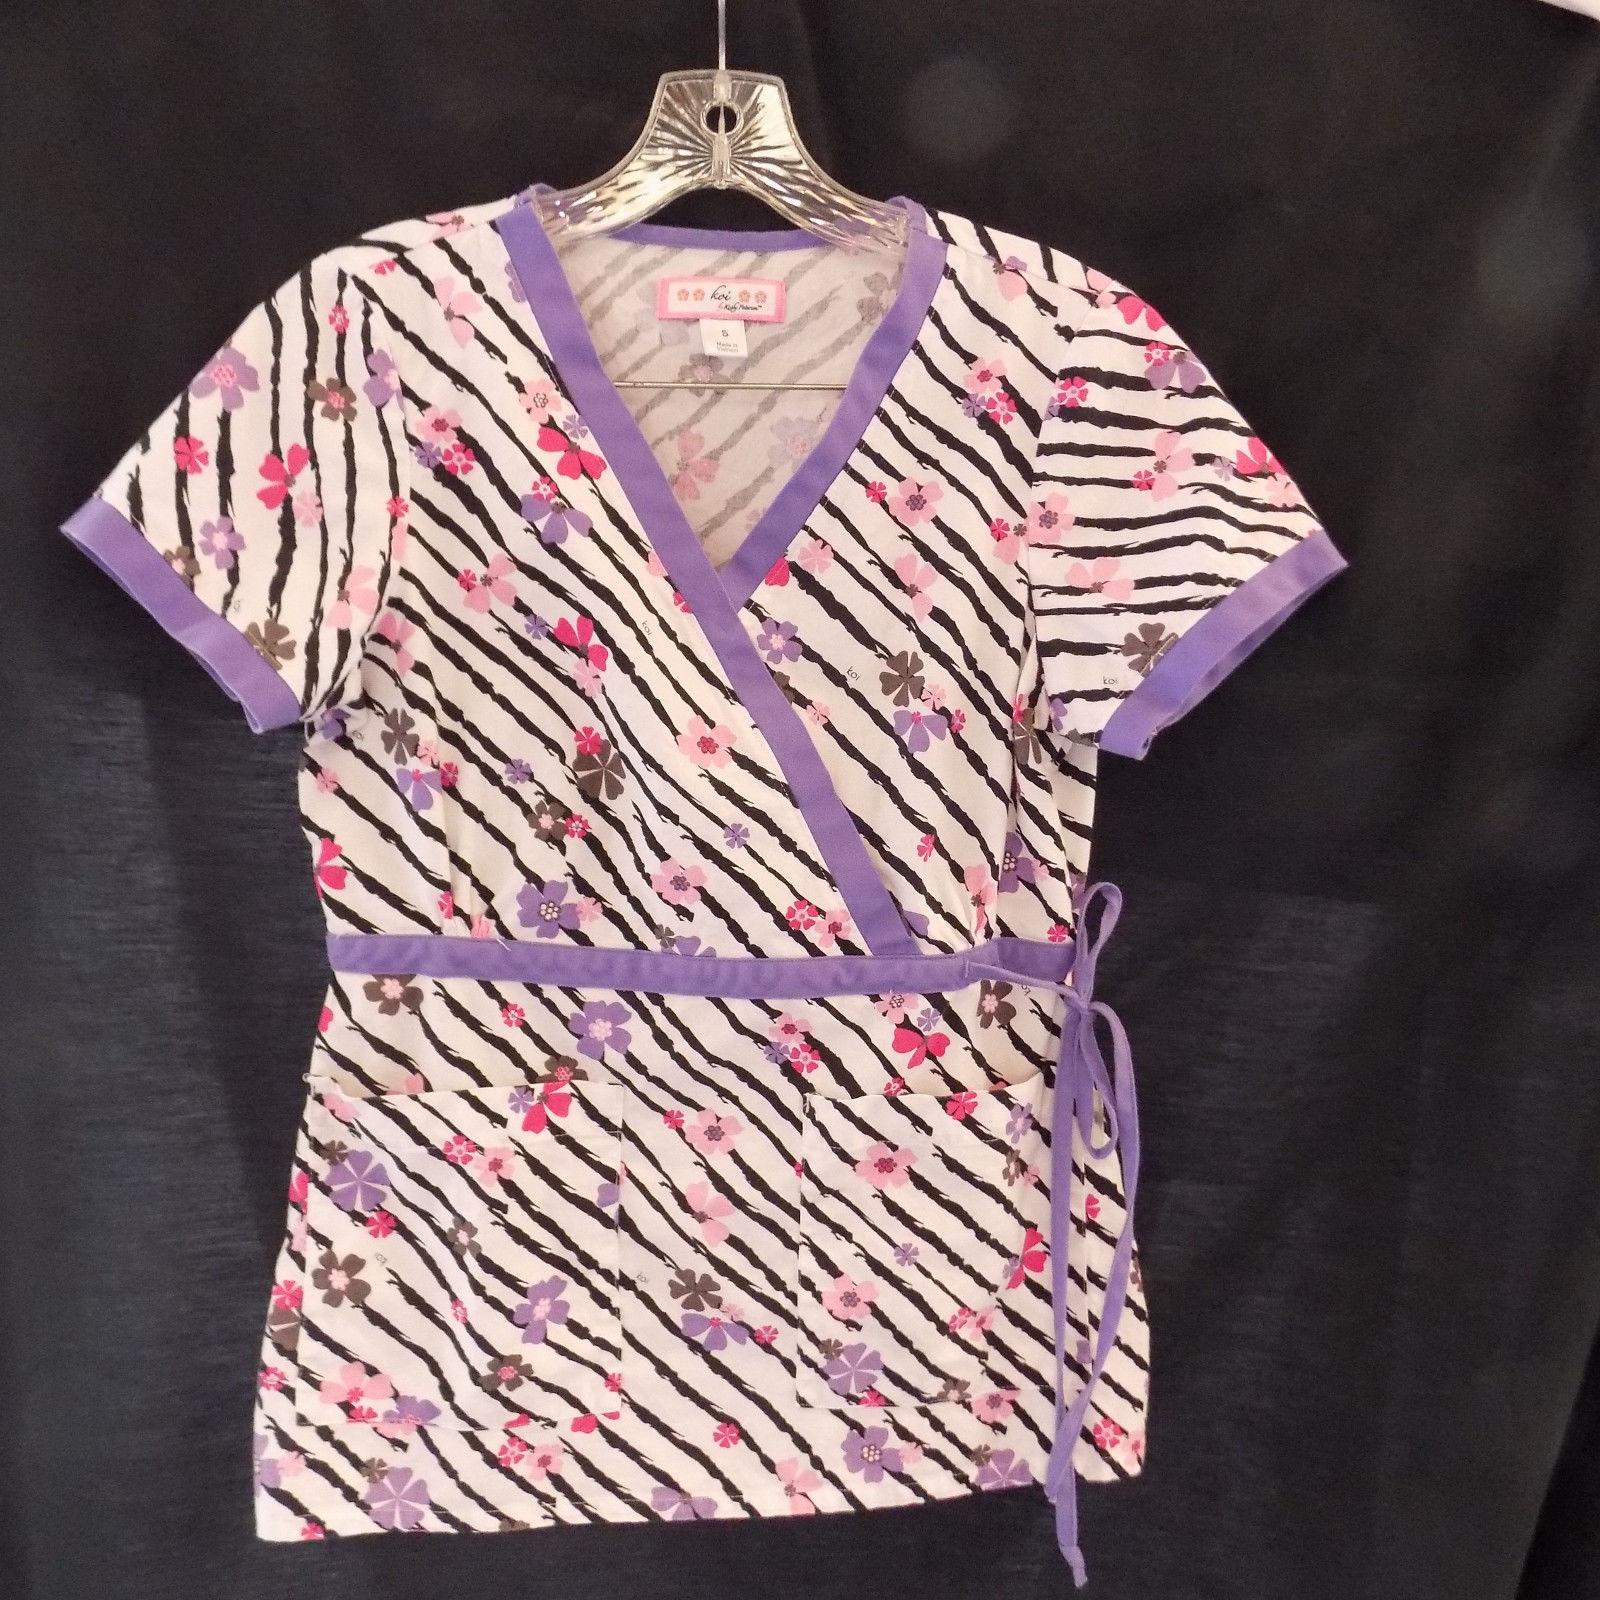 589544ab406 Koi Katelyn Scrub Top Purple Black Striped and 50 similar items